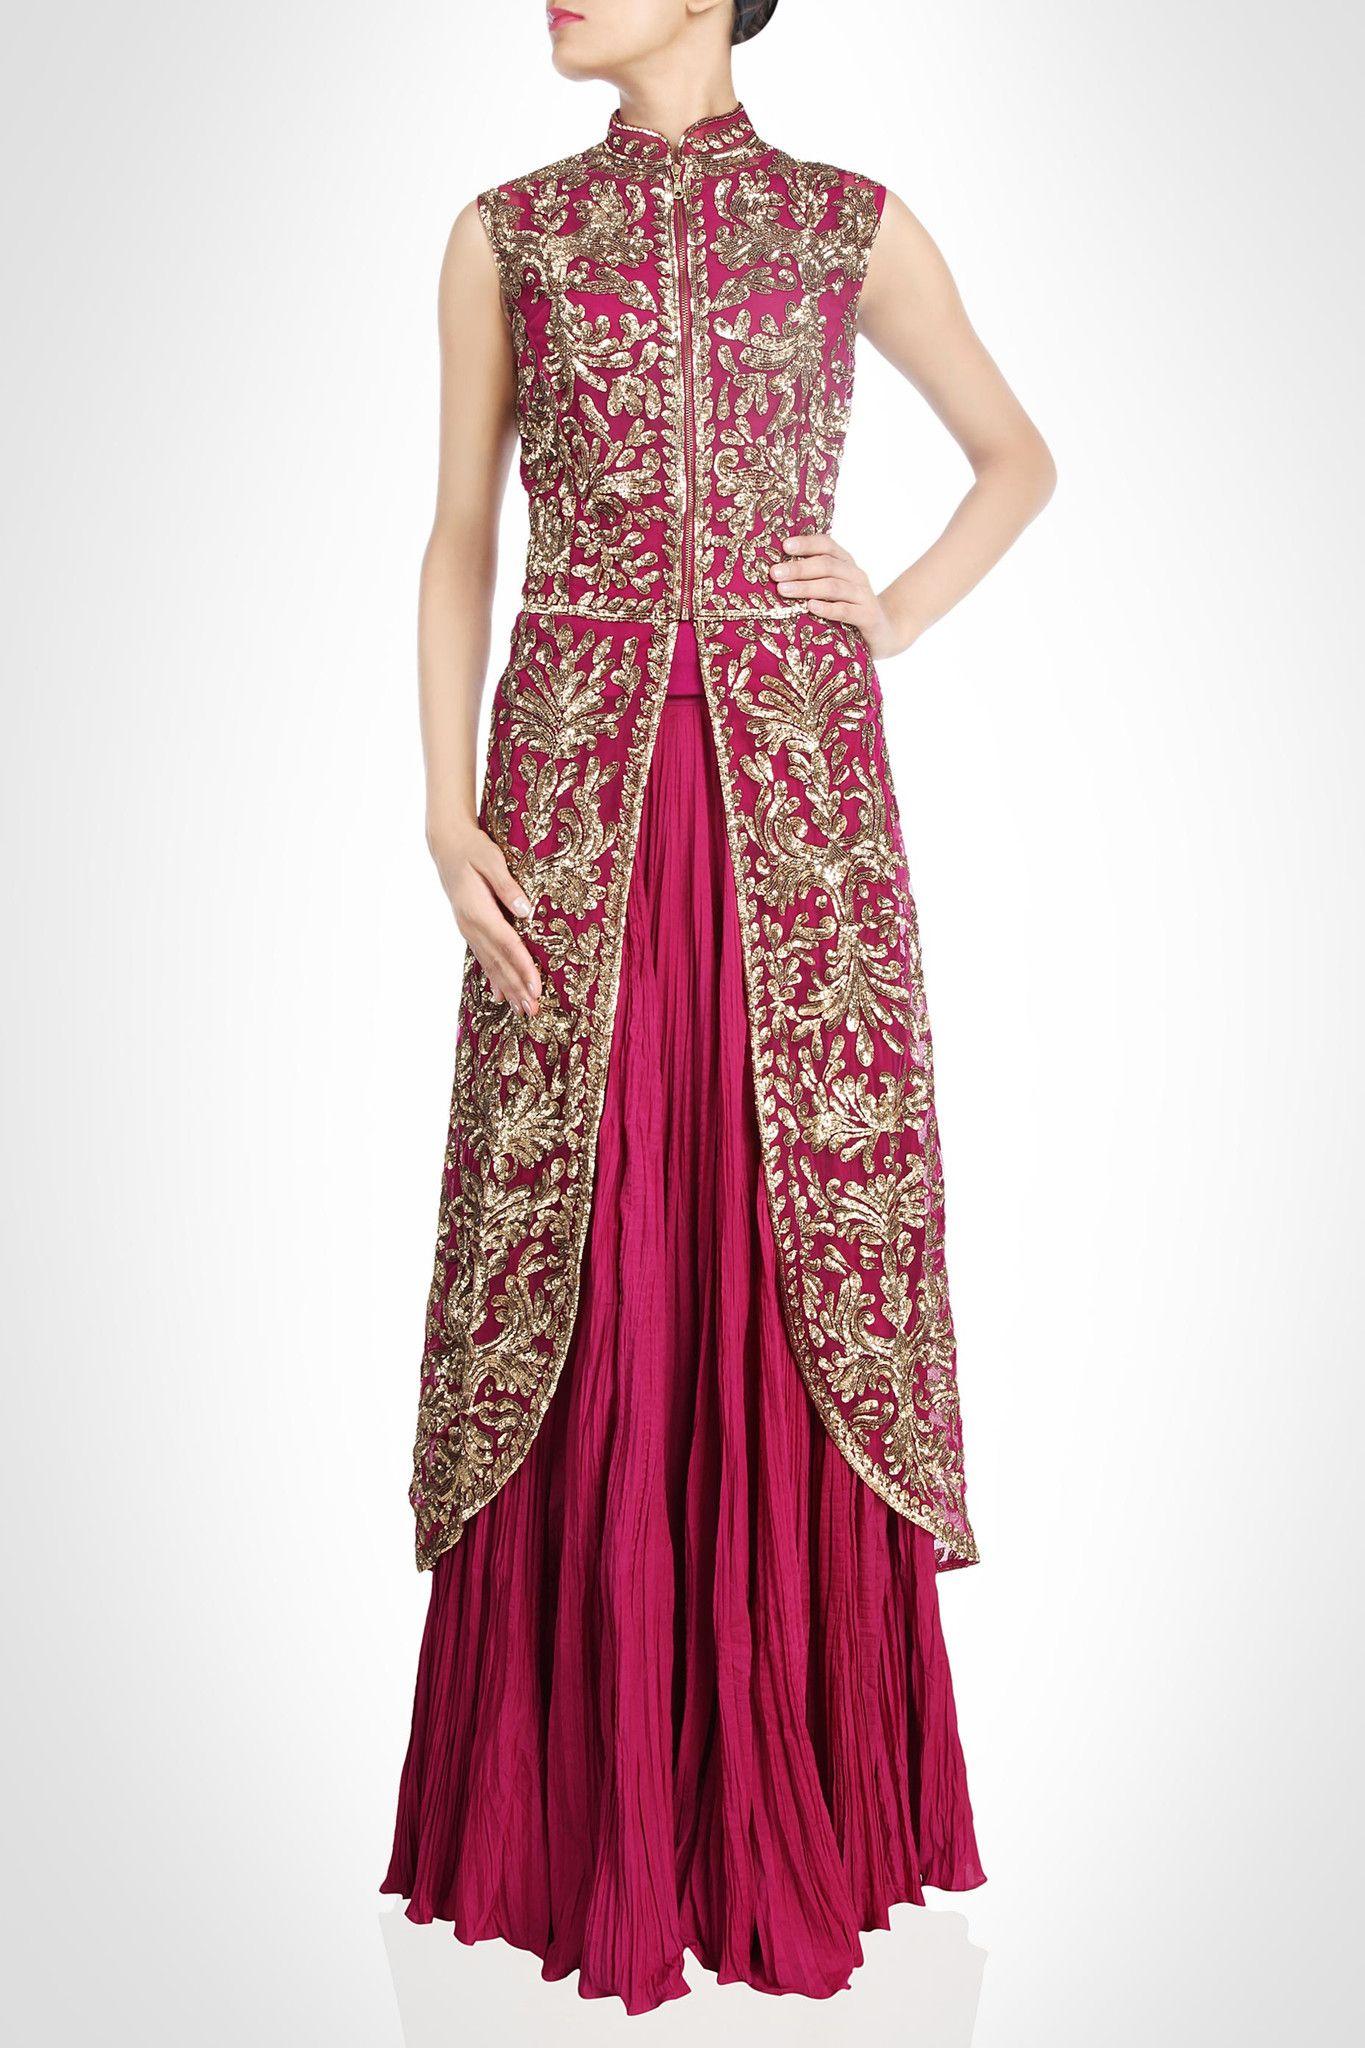 Long wedding reception dresses for the bride  Dark majenta long jacket lehenga for Wedding  Reception  wedding